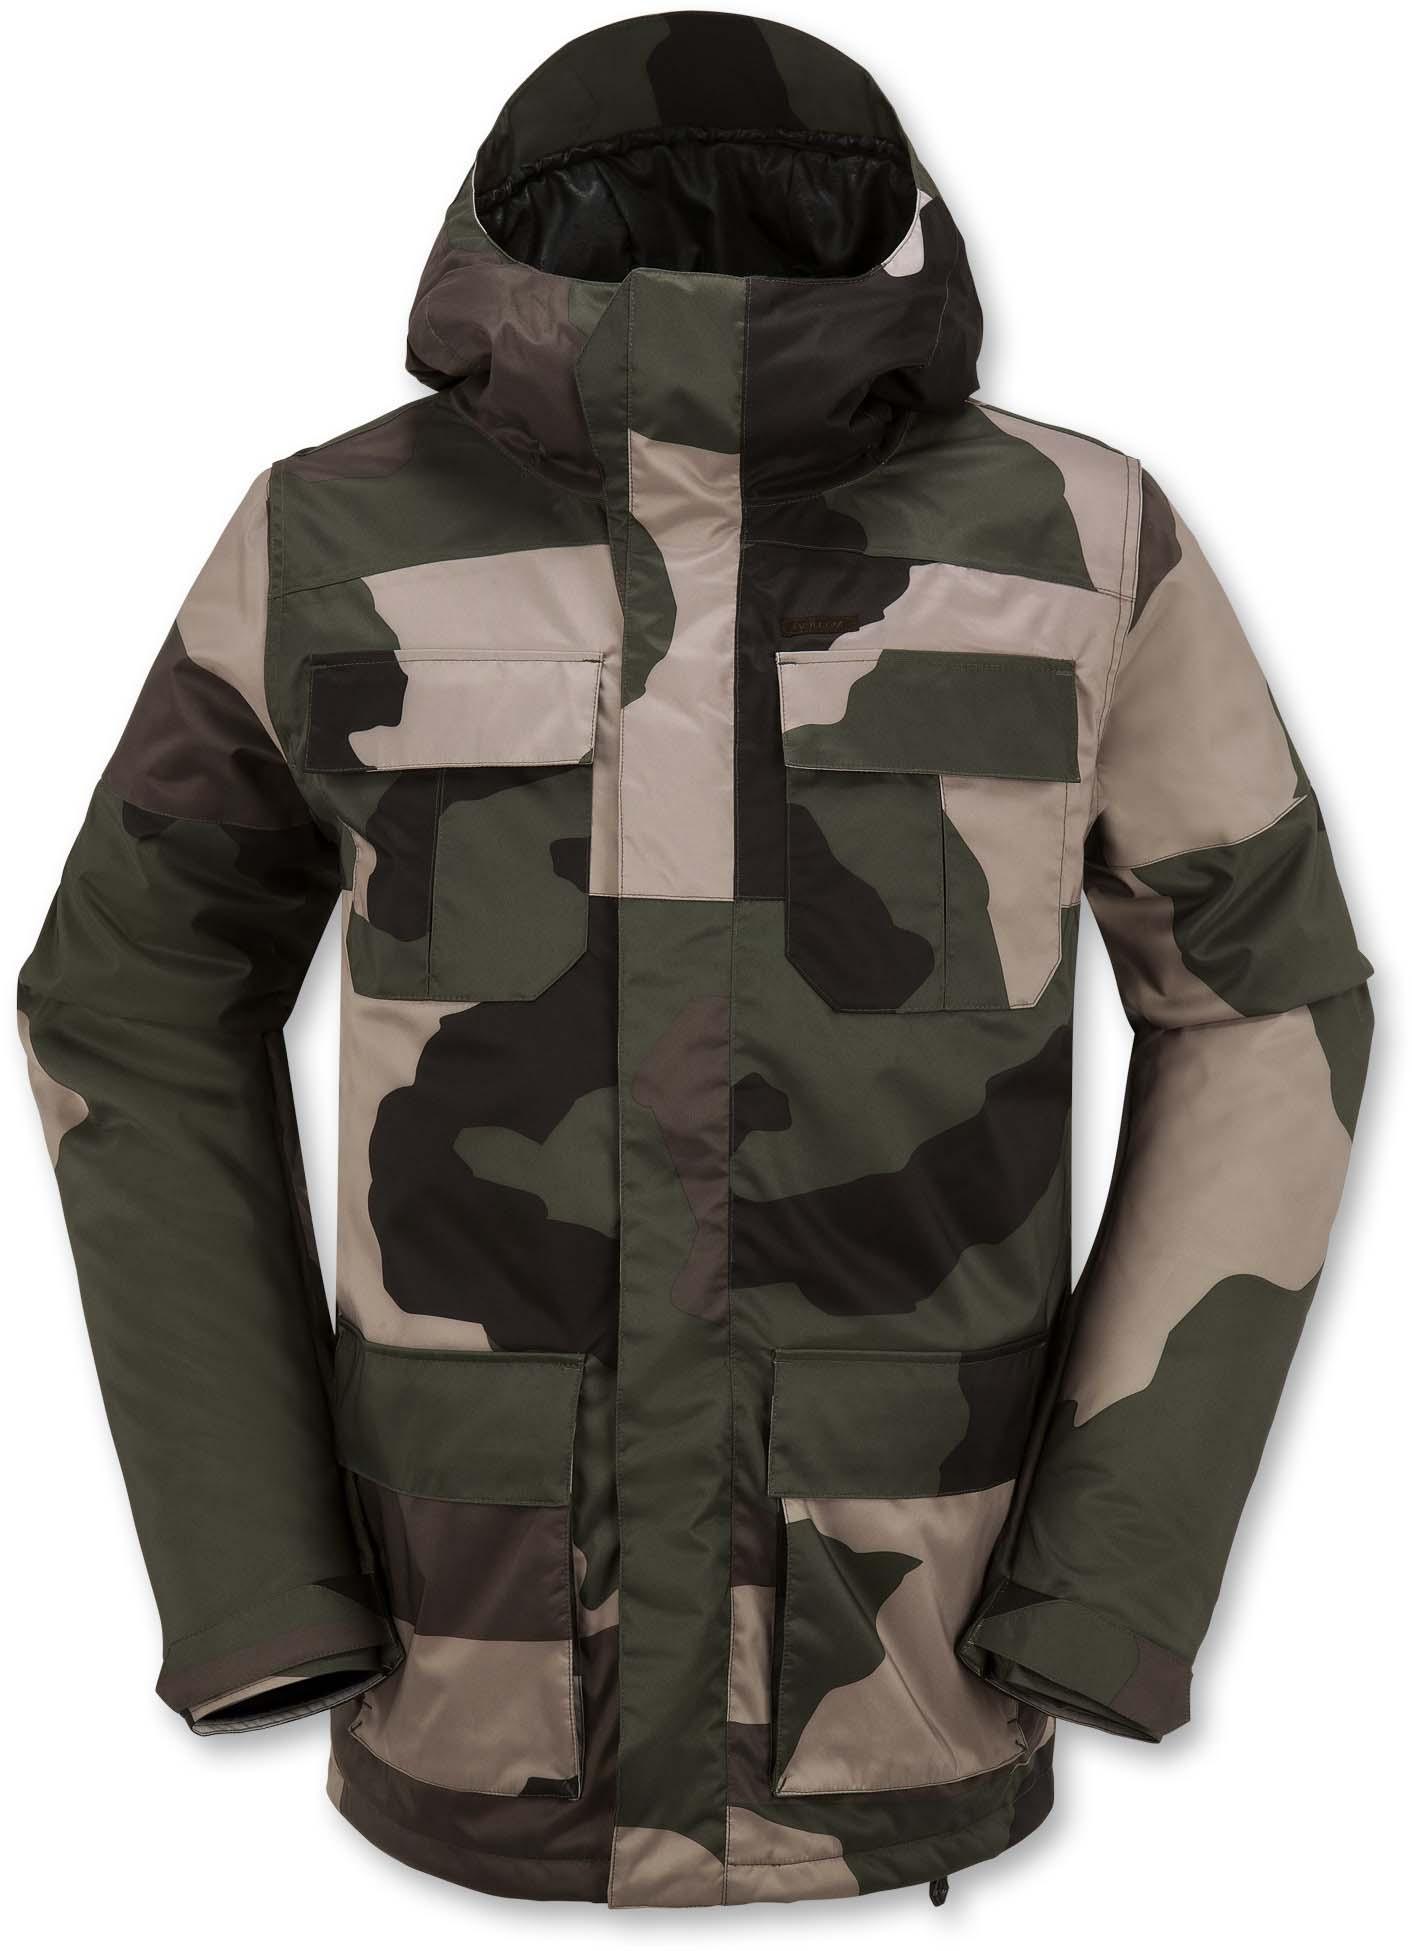 image volcom-alternate-insulated-jacket-camo-jpg